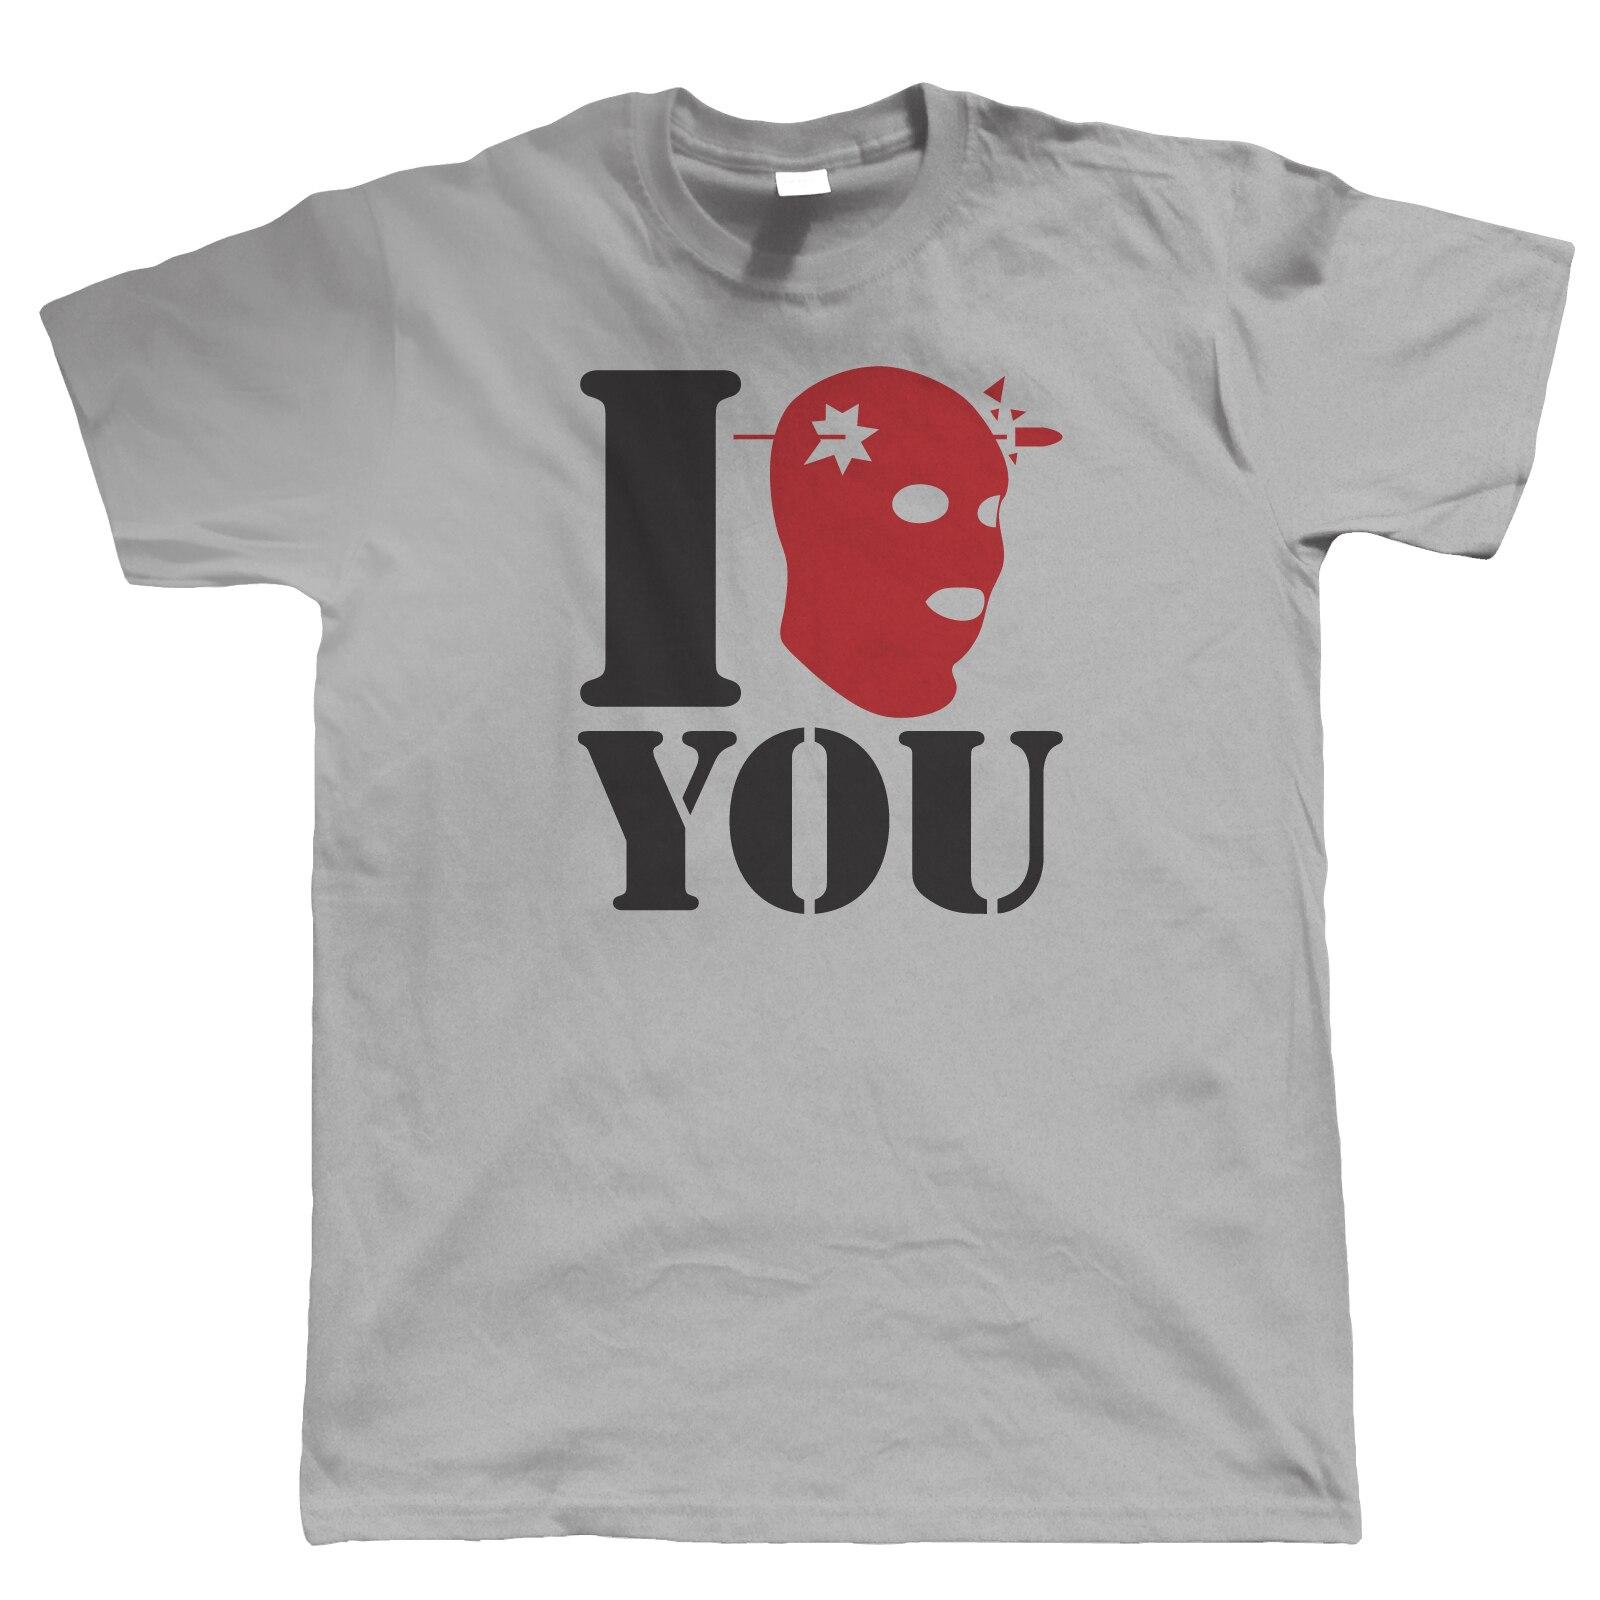 I Headshot You Mens Gamer T Shirt - Counter Terrorist FPS Video Game Strike Hip Hop Novelty T-Shirts MenS Brand Clothing